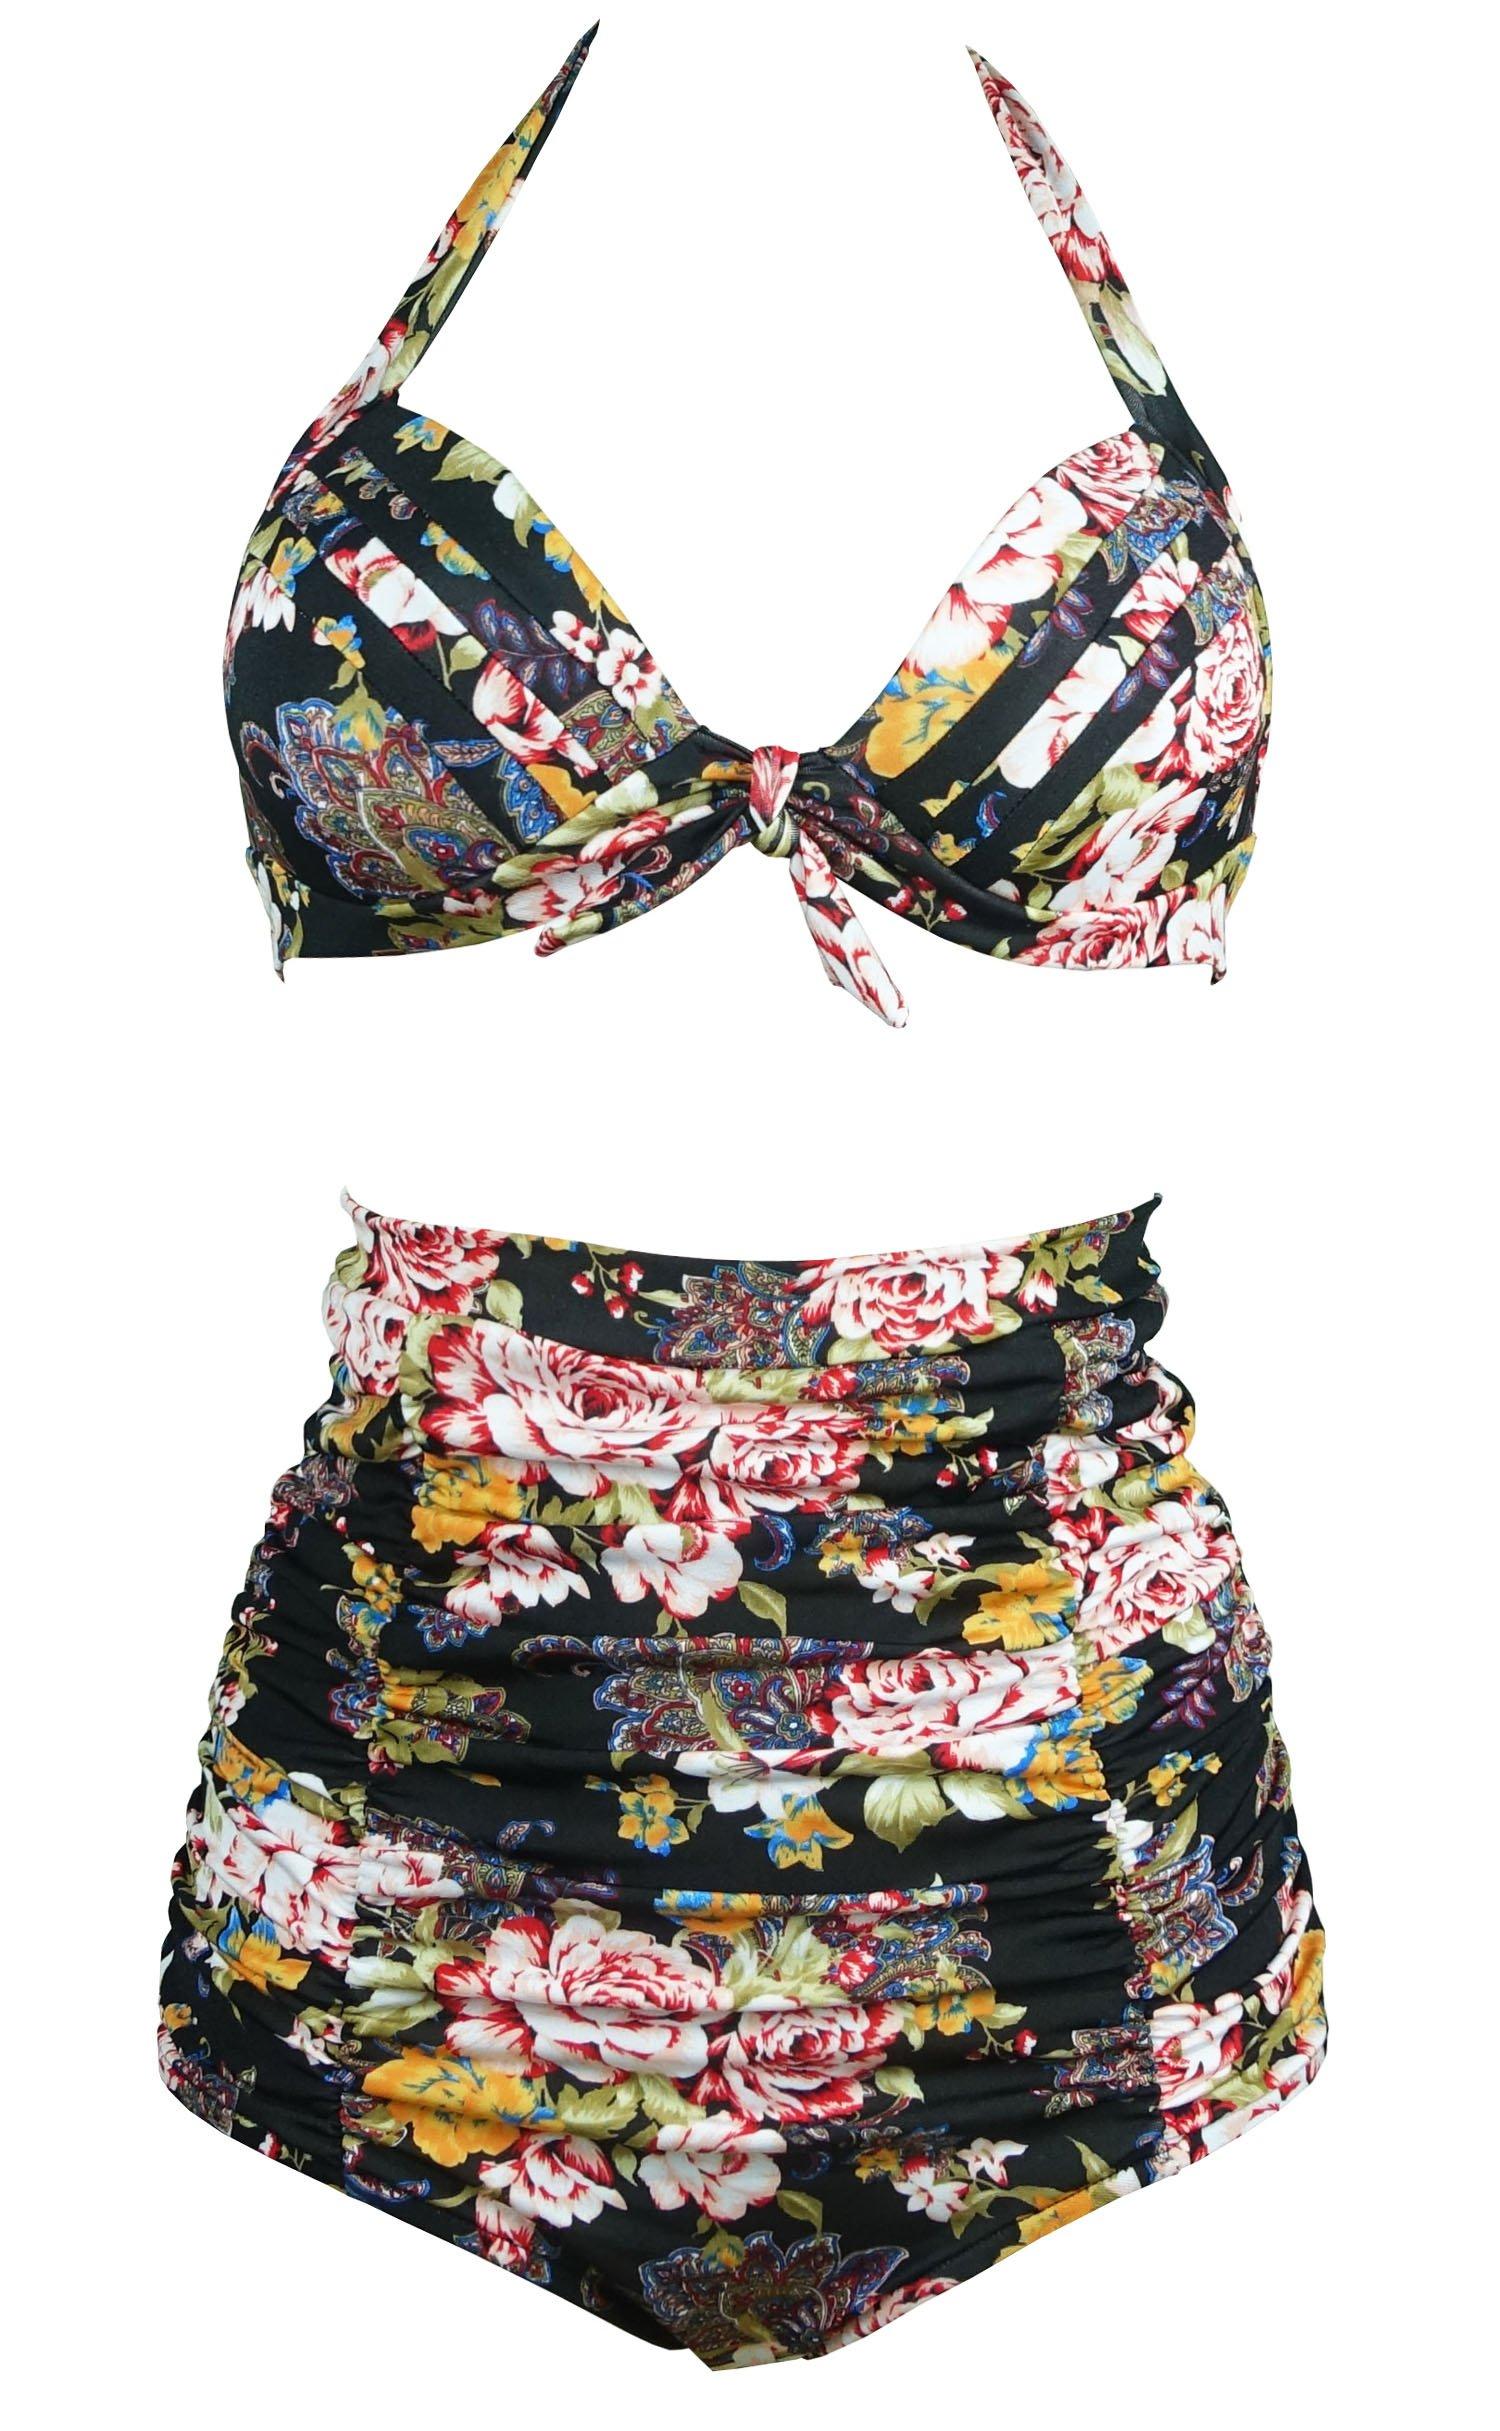 0a741223b6 Galleon - COCOSHIP Retro Black & Peony Floral Halter High Waisted Bikini  Bathing Suit Swimsuit XXXL(FBA)